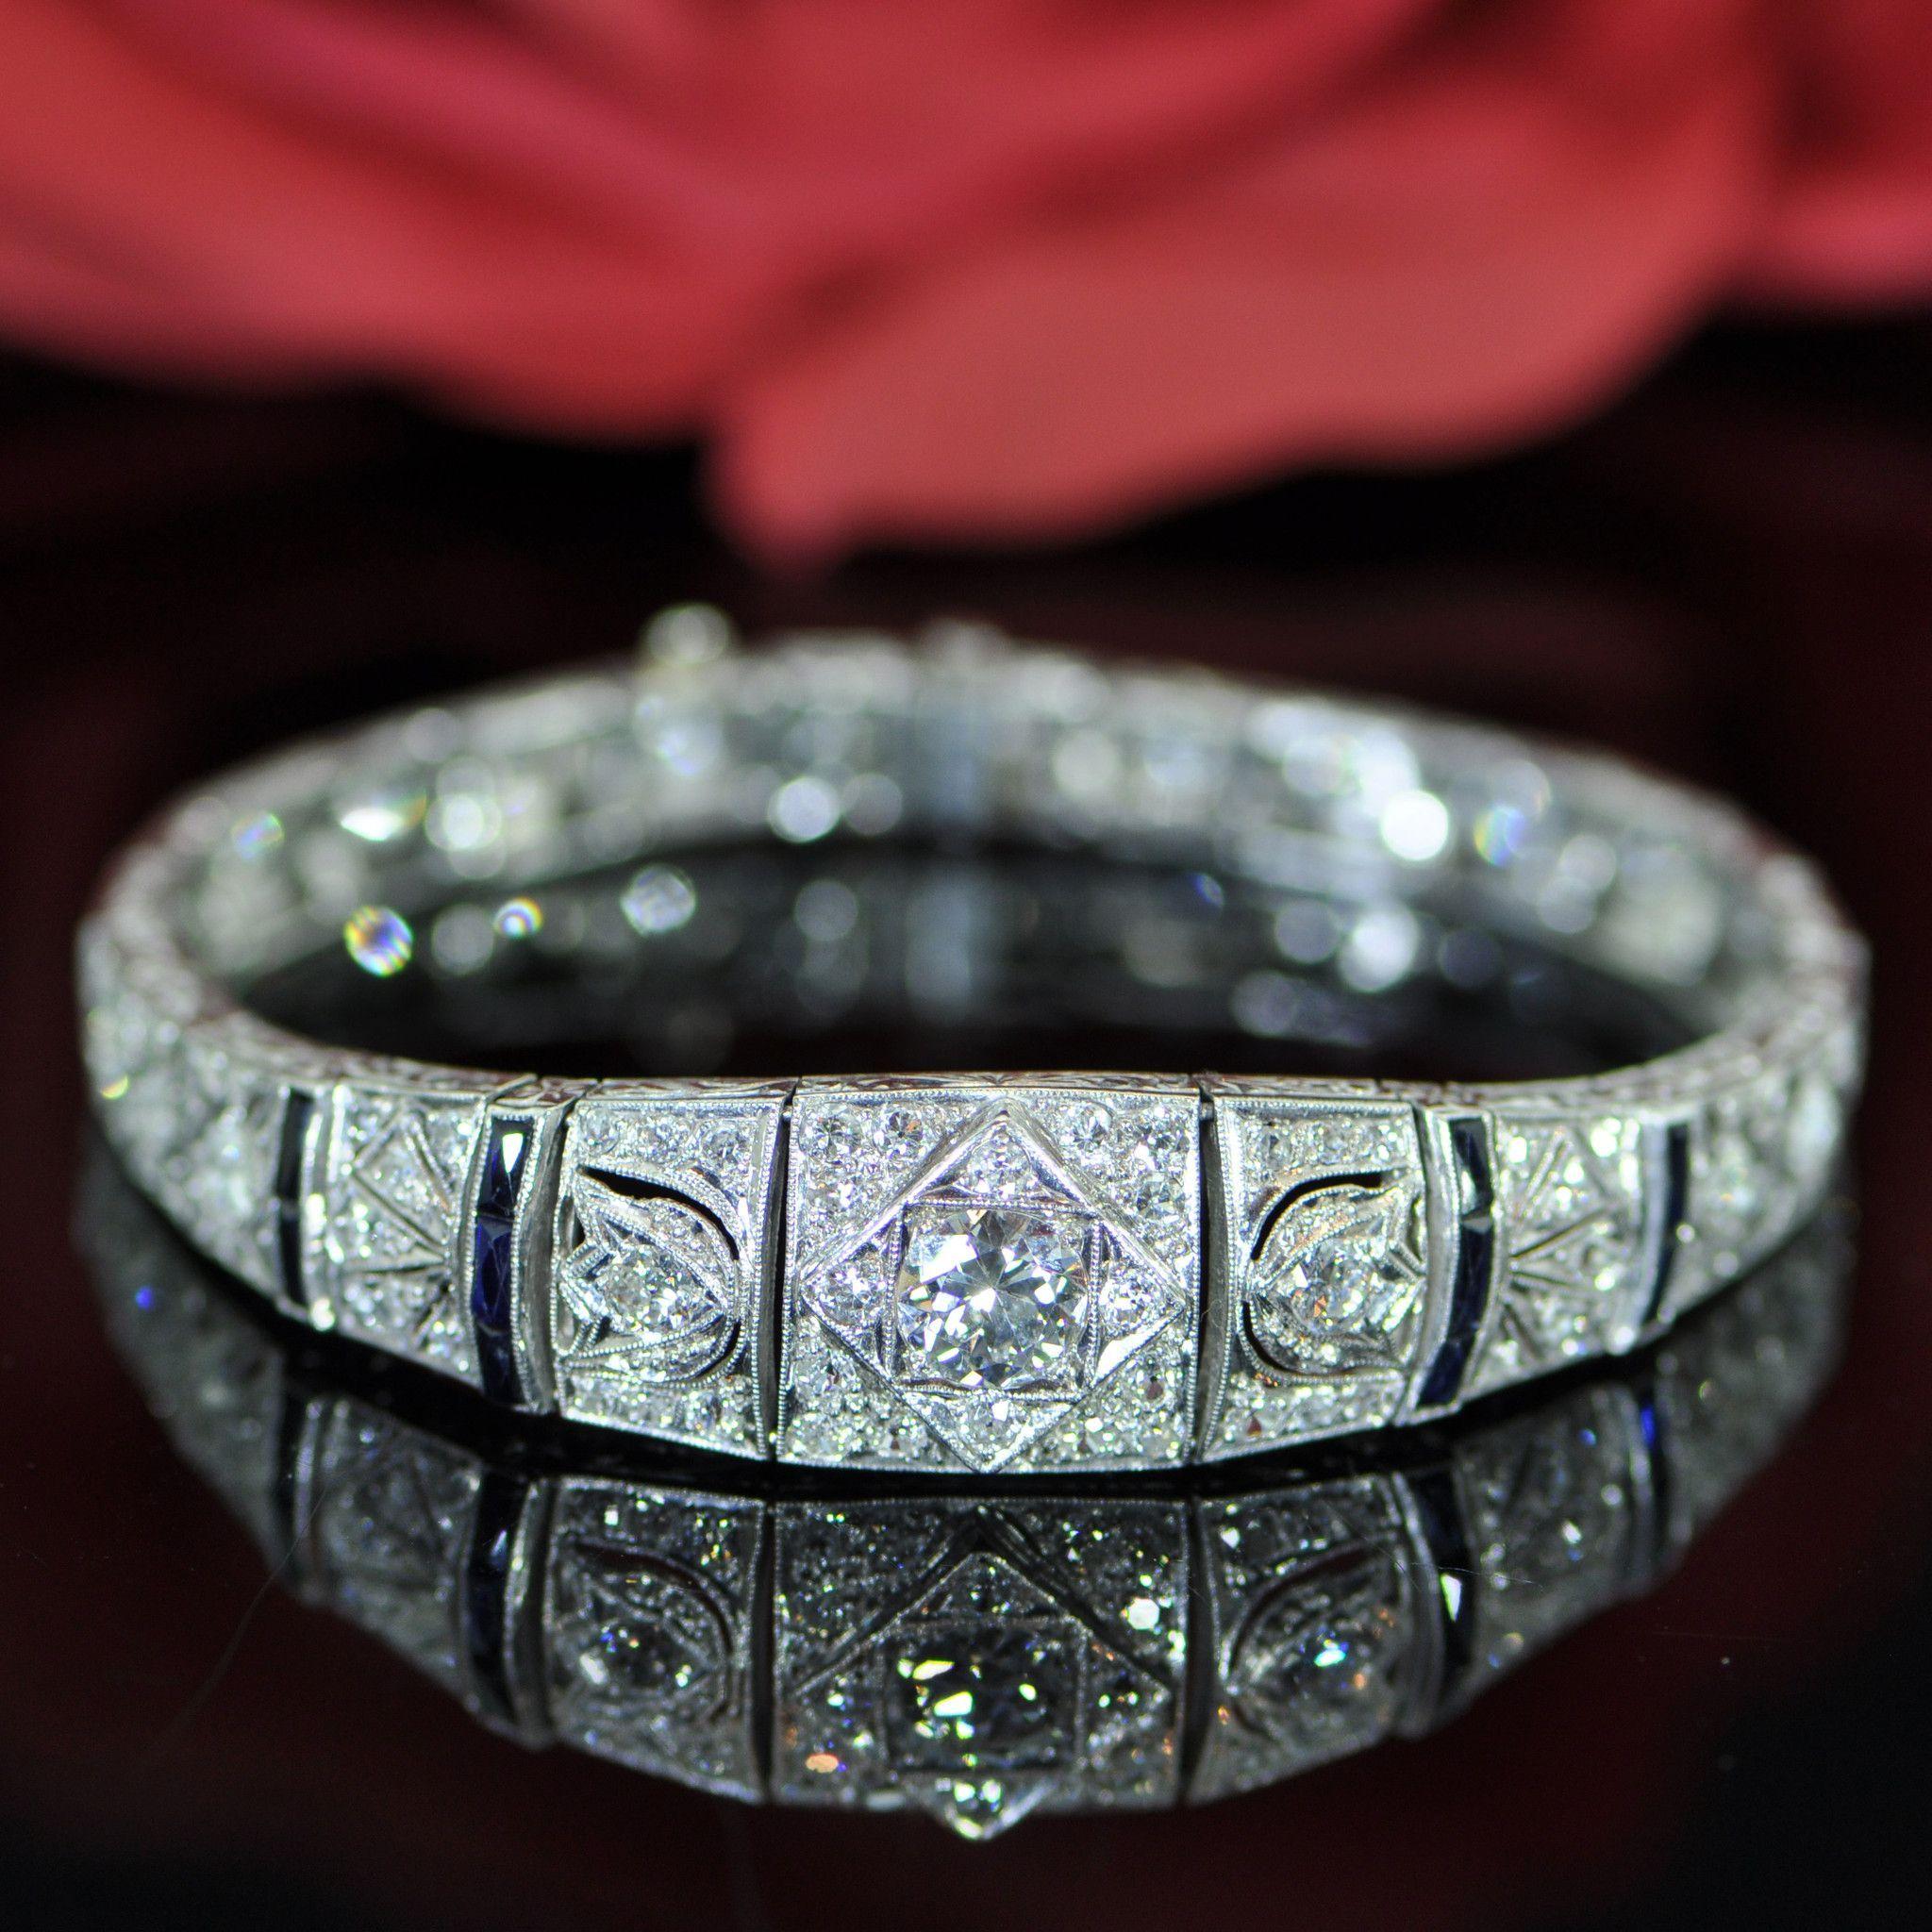 An Edwardian Platinum, Diamond and Sapphire Bracelet, 15.60 dwts.